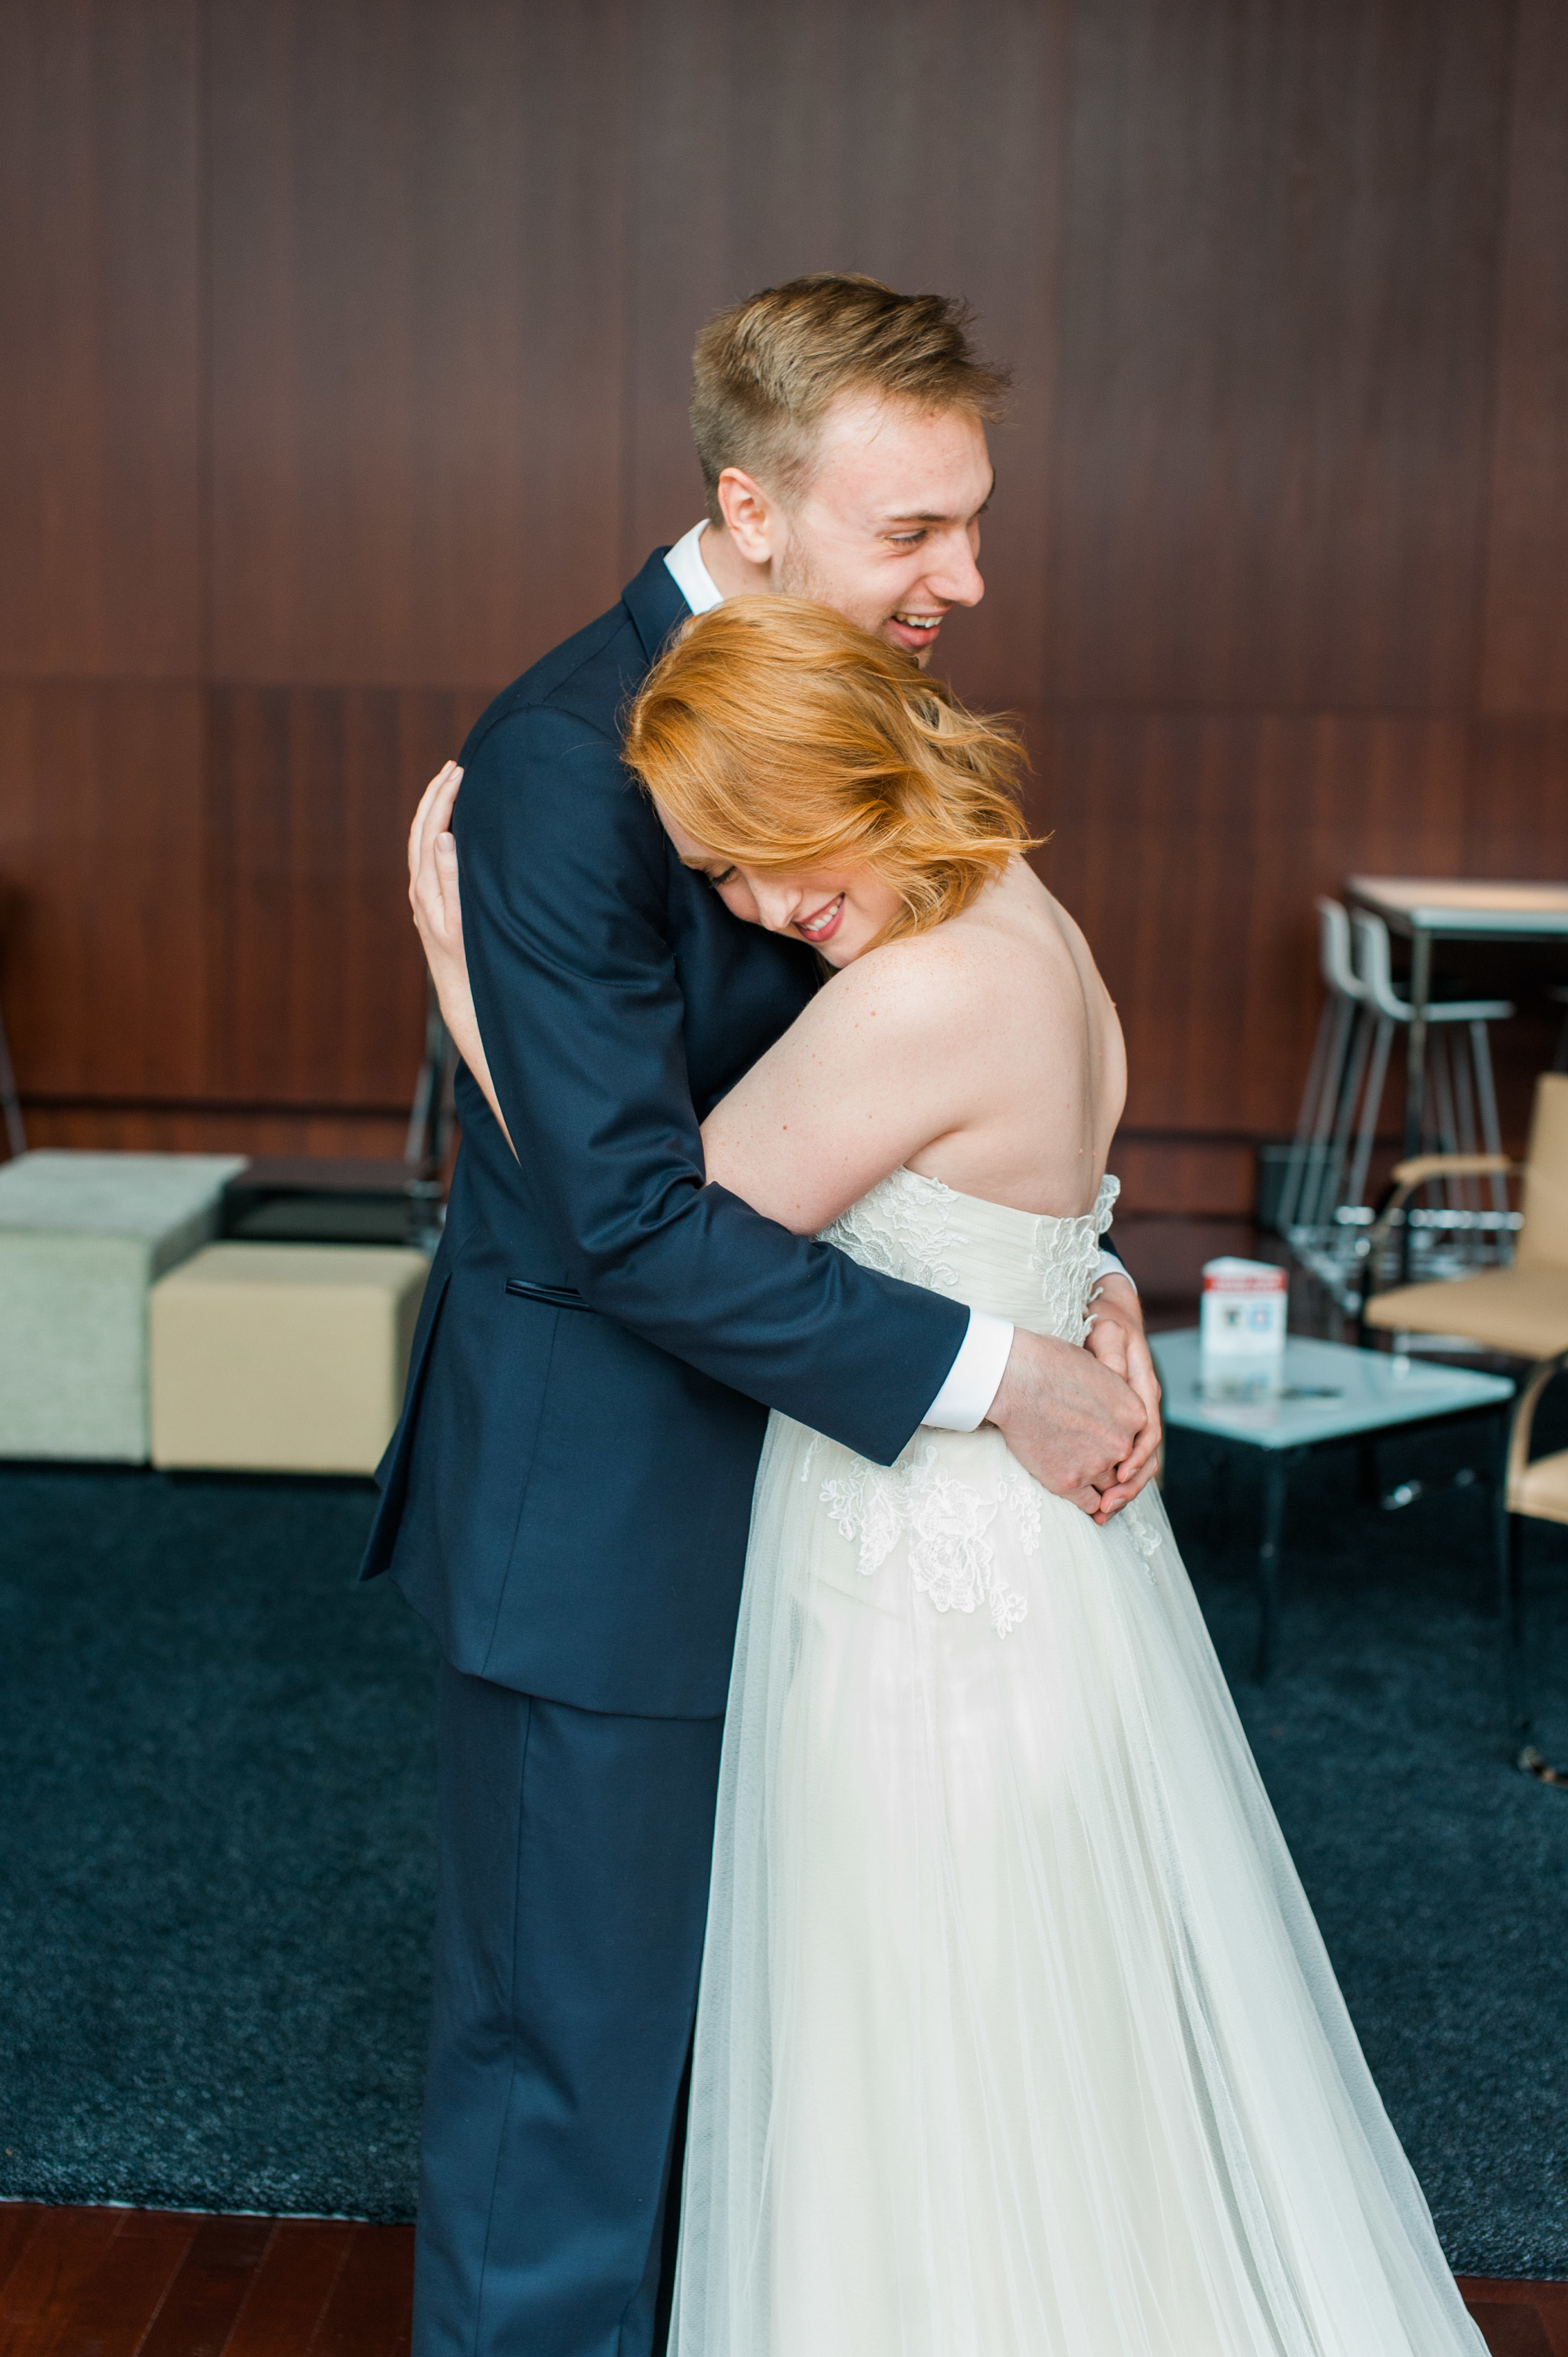 omaha-holland-arts-center-wedding-28.jpg